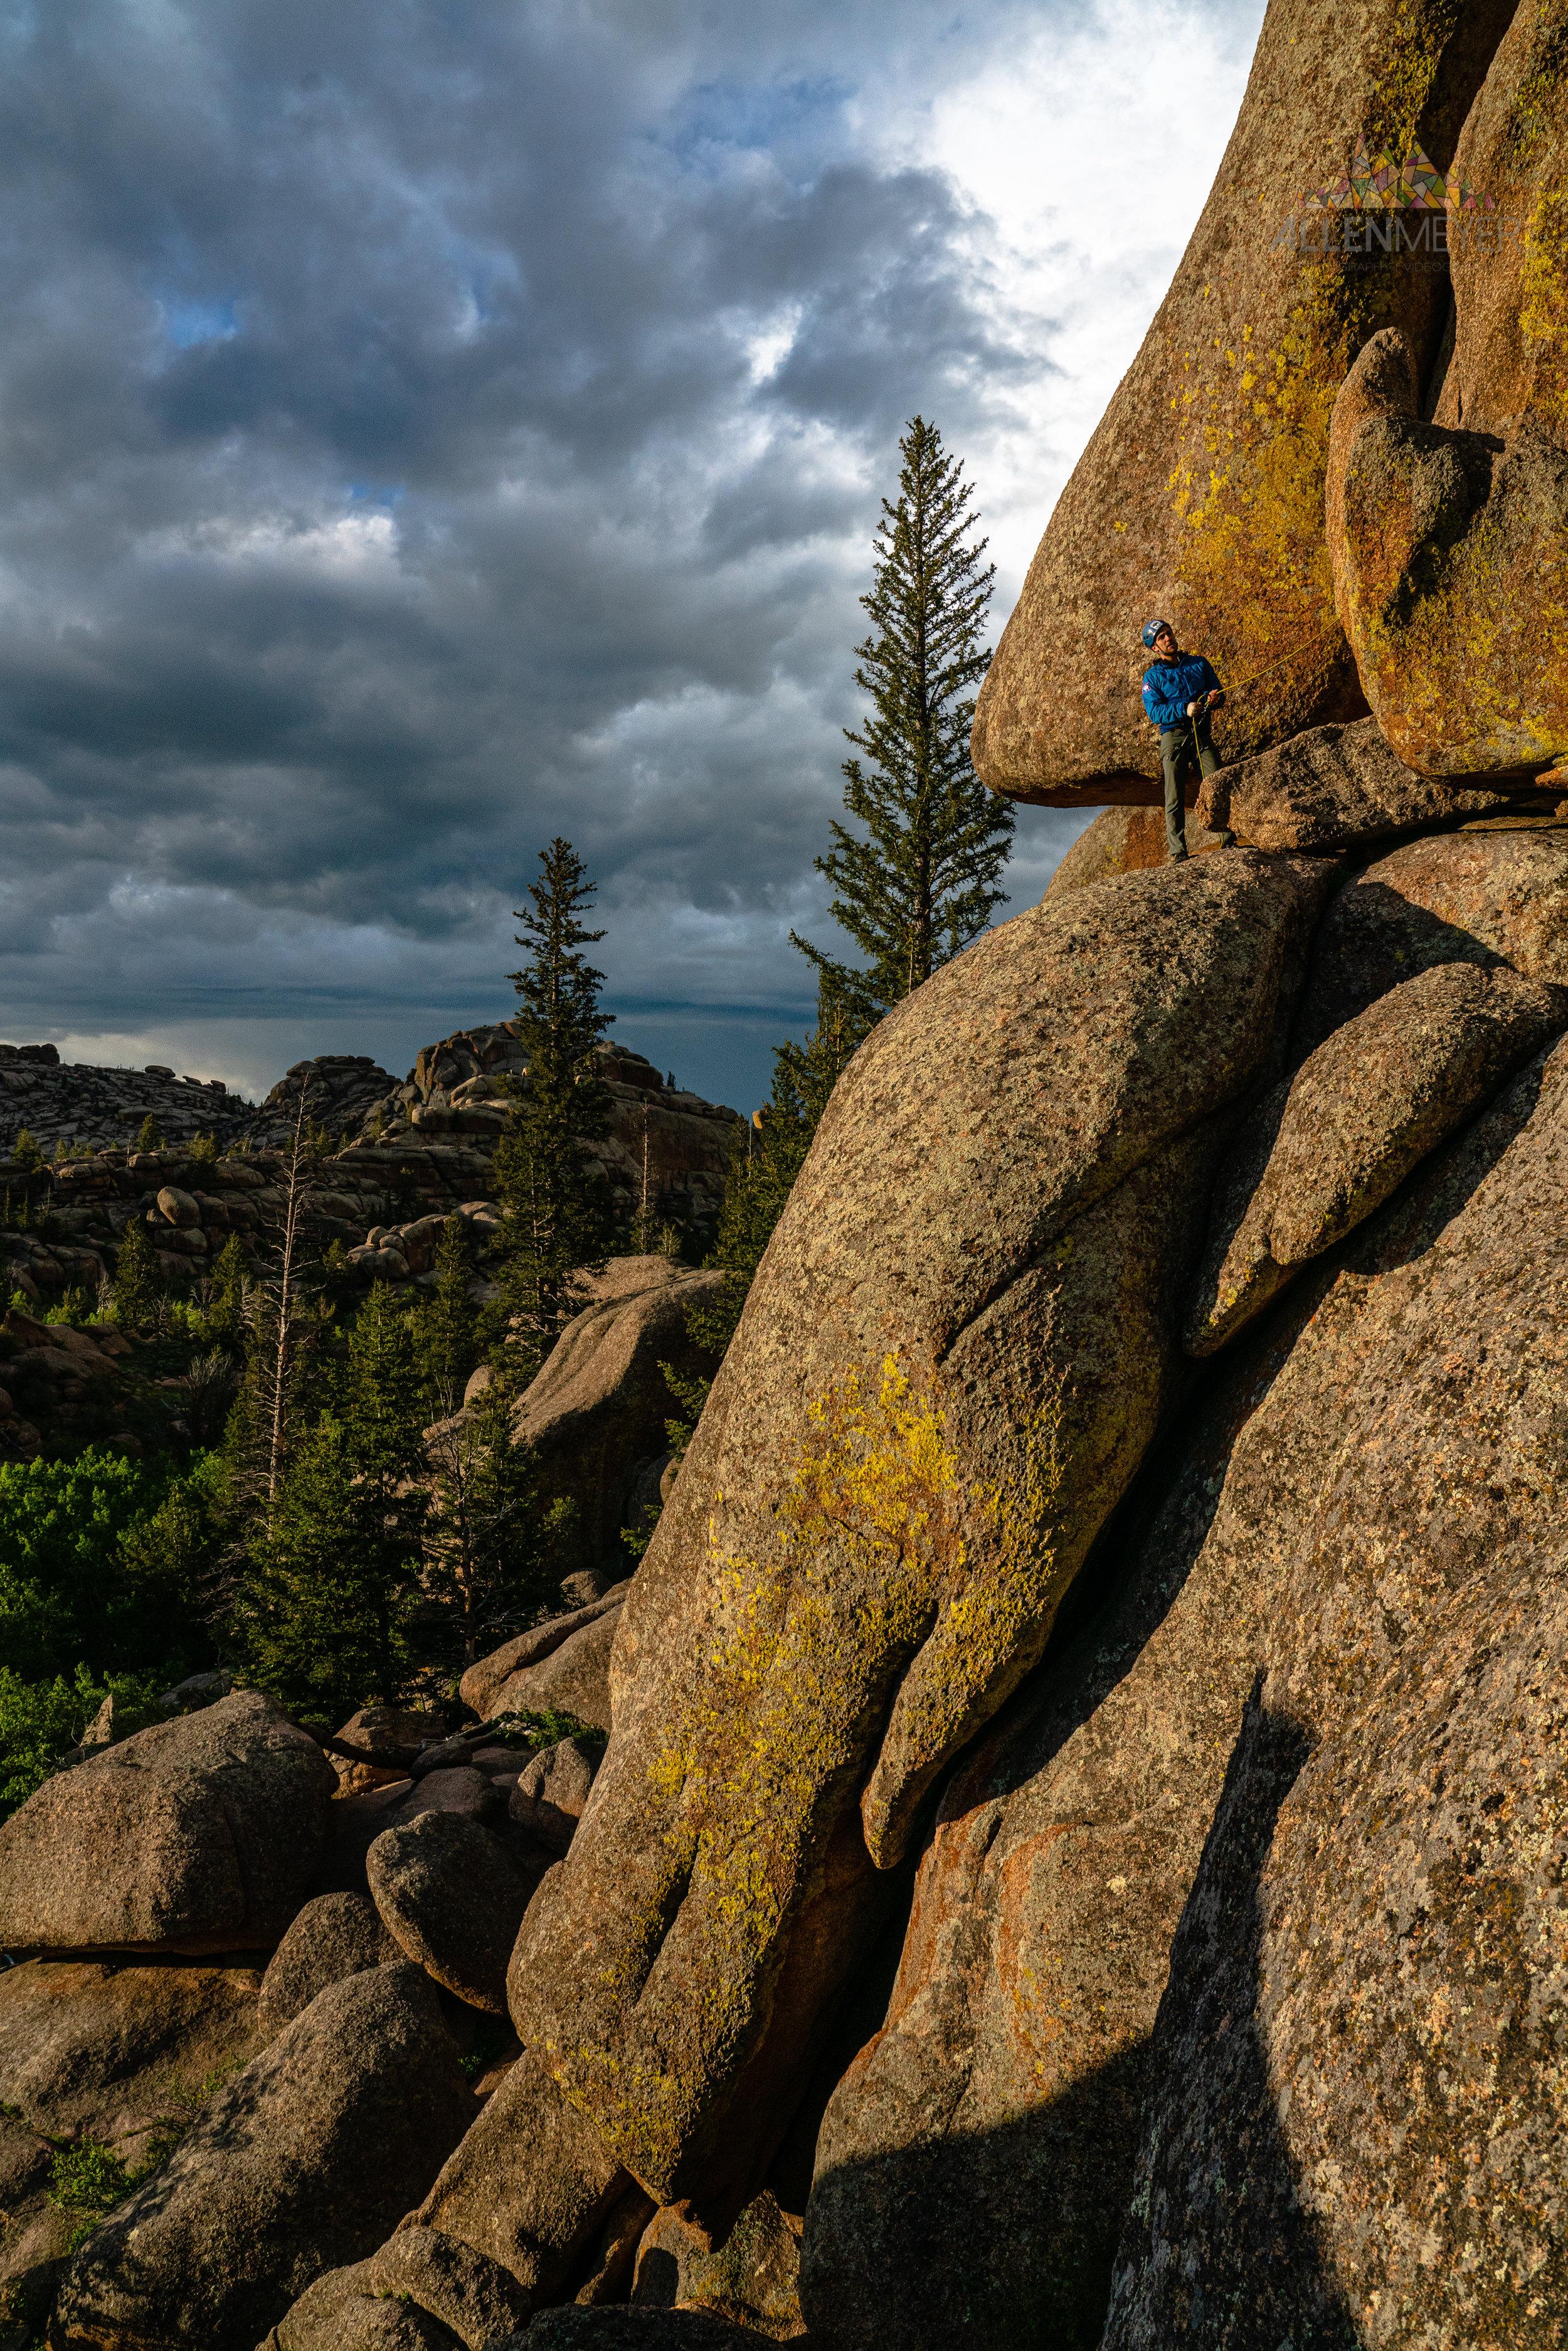 Outdoor Adventures In Cheyenne, Wyoming; Photography by Allen Meyer-05492.jpg